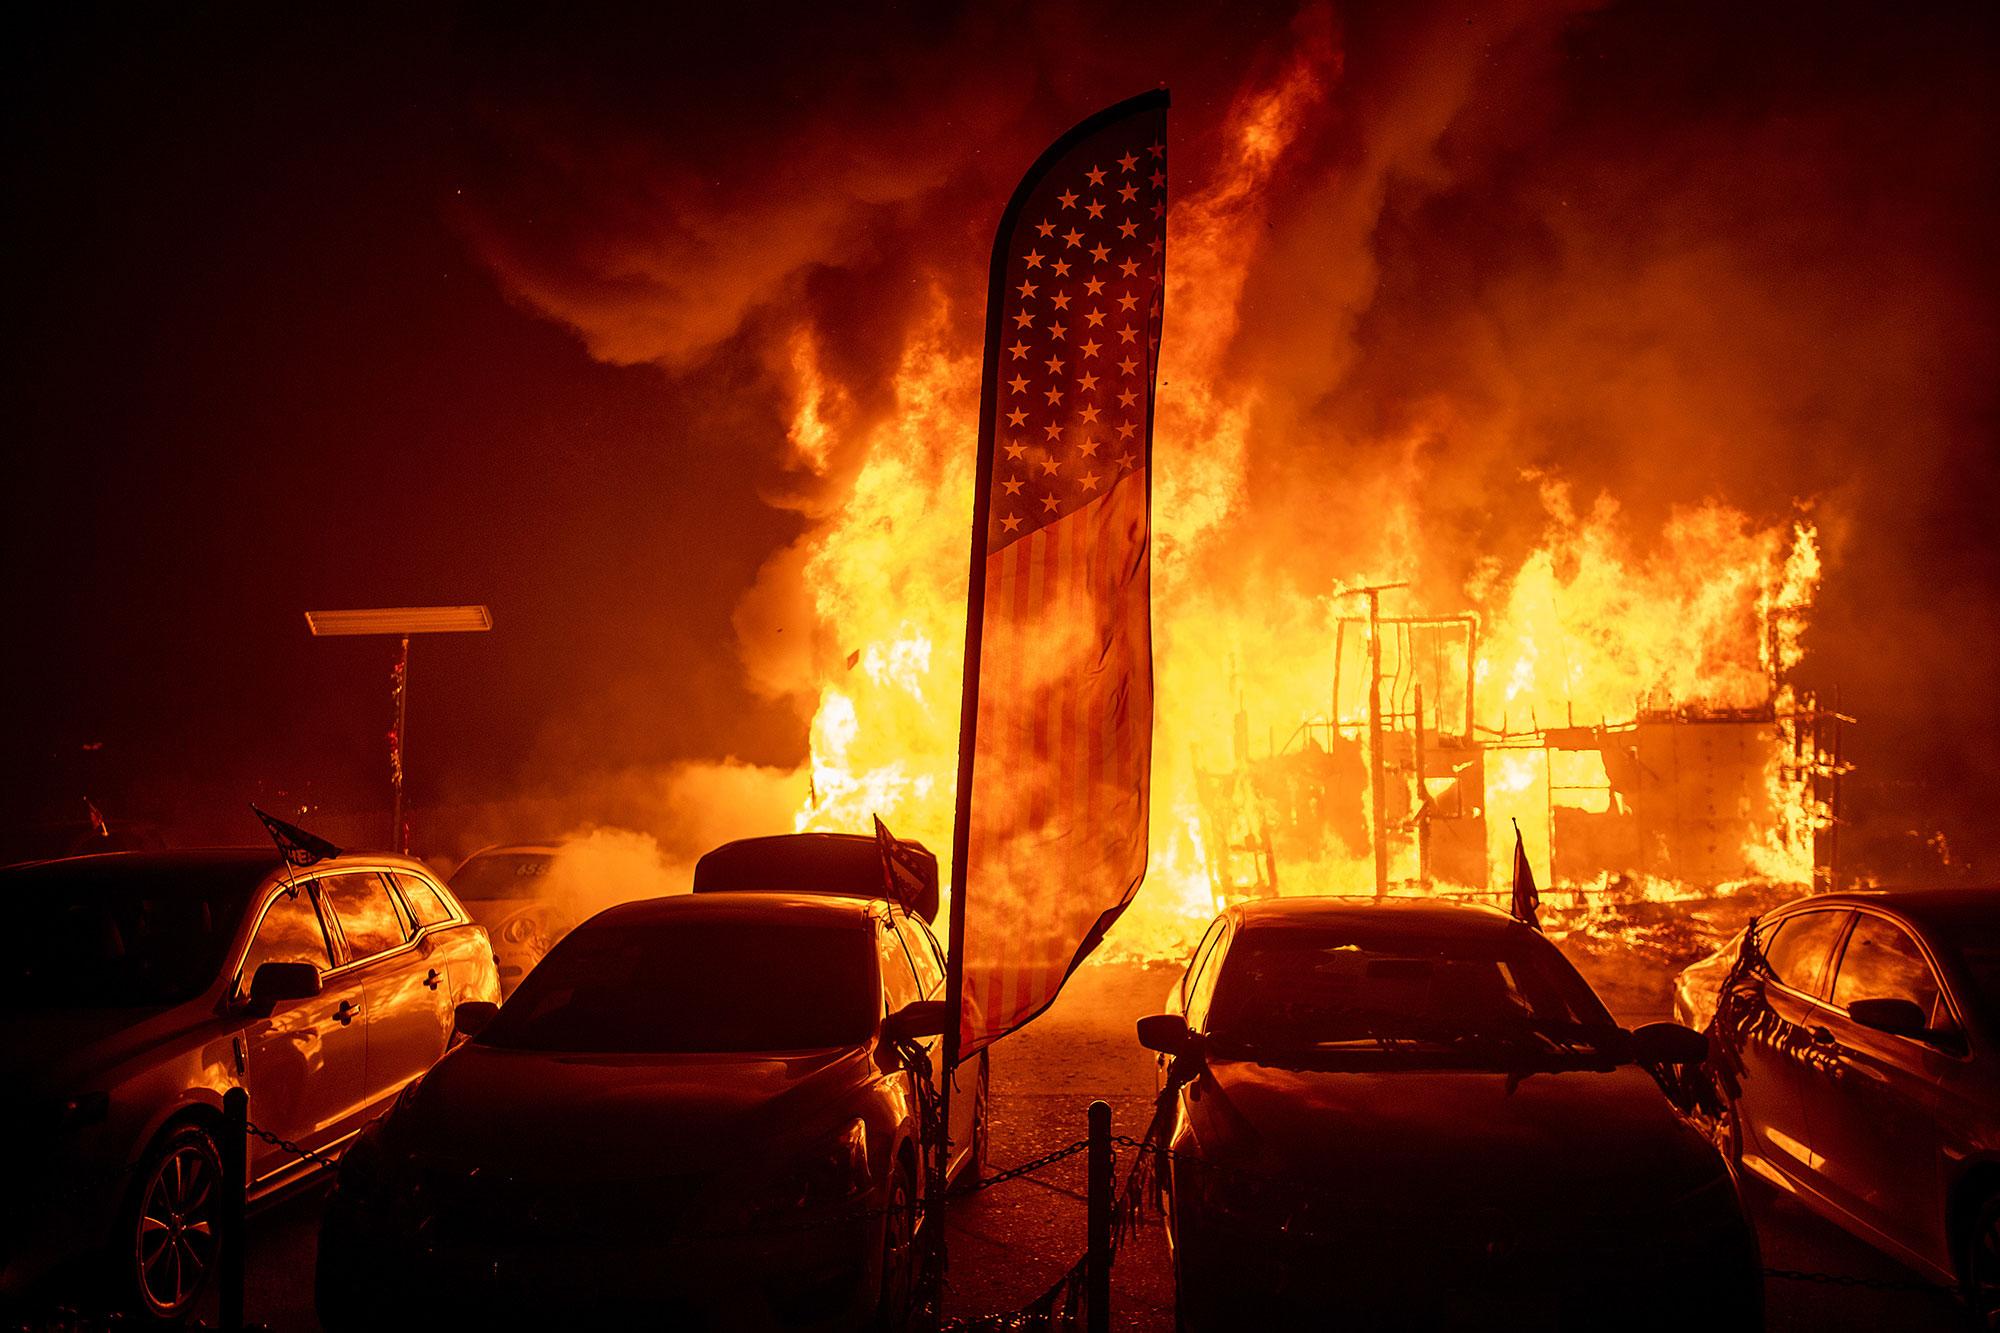 <div class='meta'><div class='origin-logo' data-origin='none'></div><span class='caption-text' data-credit='Noah Berger/AP Photo'>Flames consume a car dealership as the Camp Fire tears through Paradise, Calif., on Thursday, Nov. 8, 2018.</span></div>